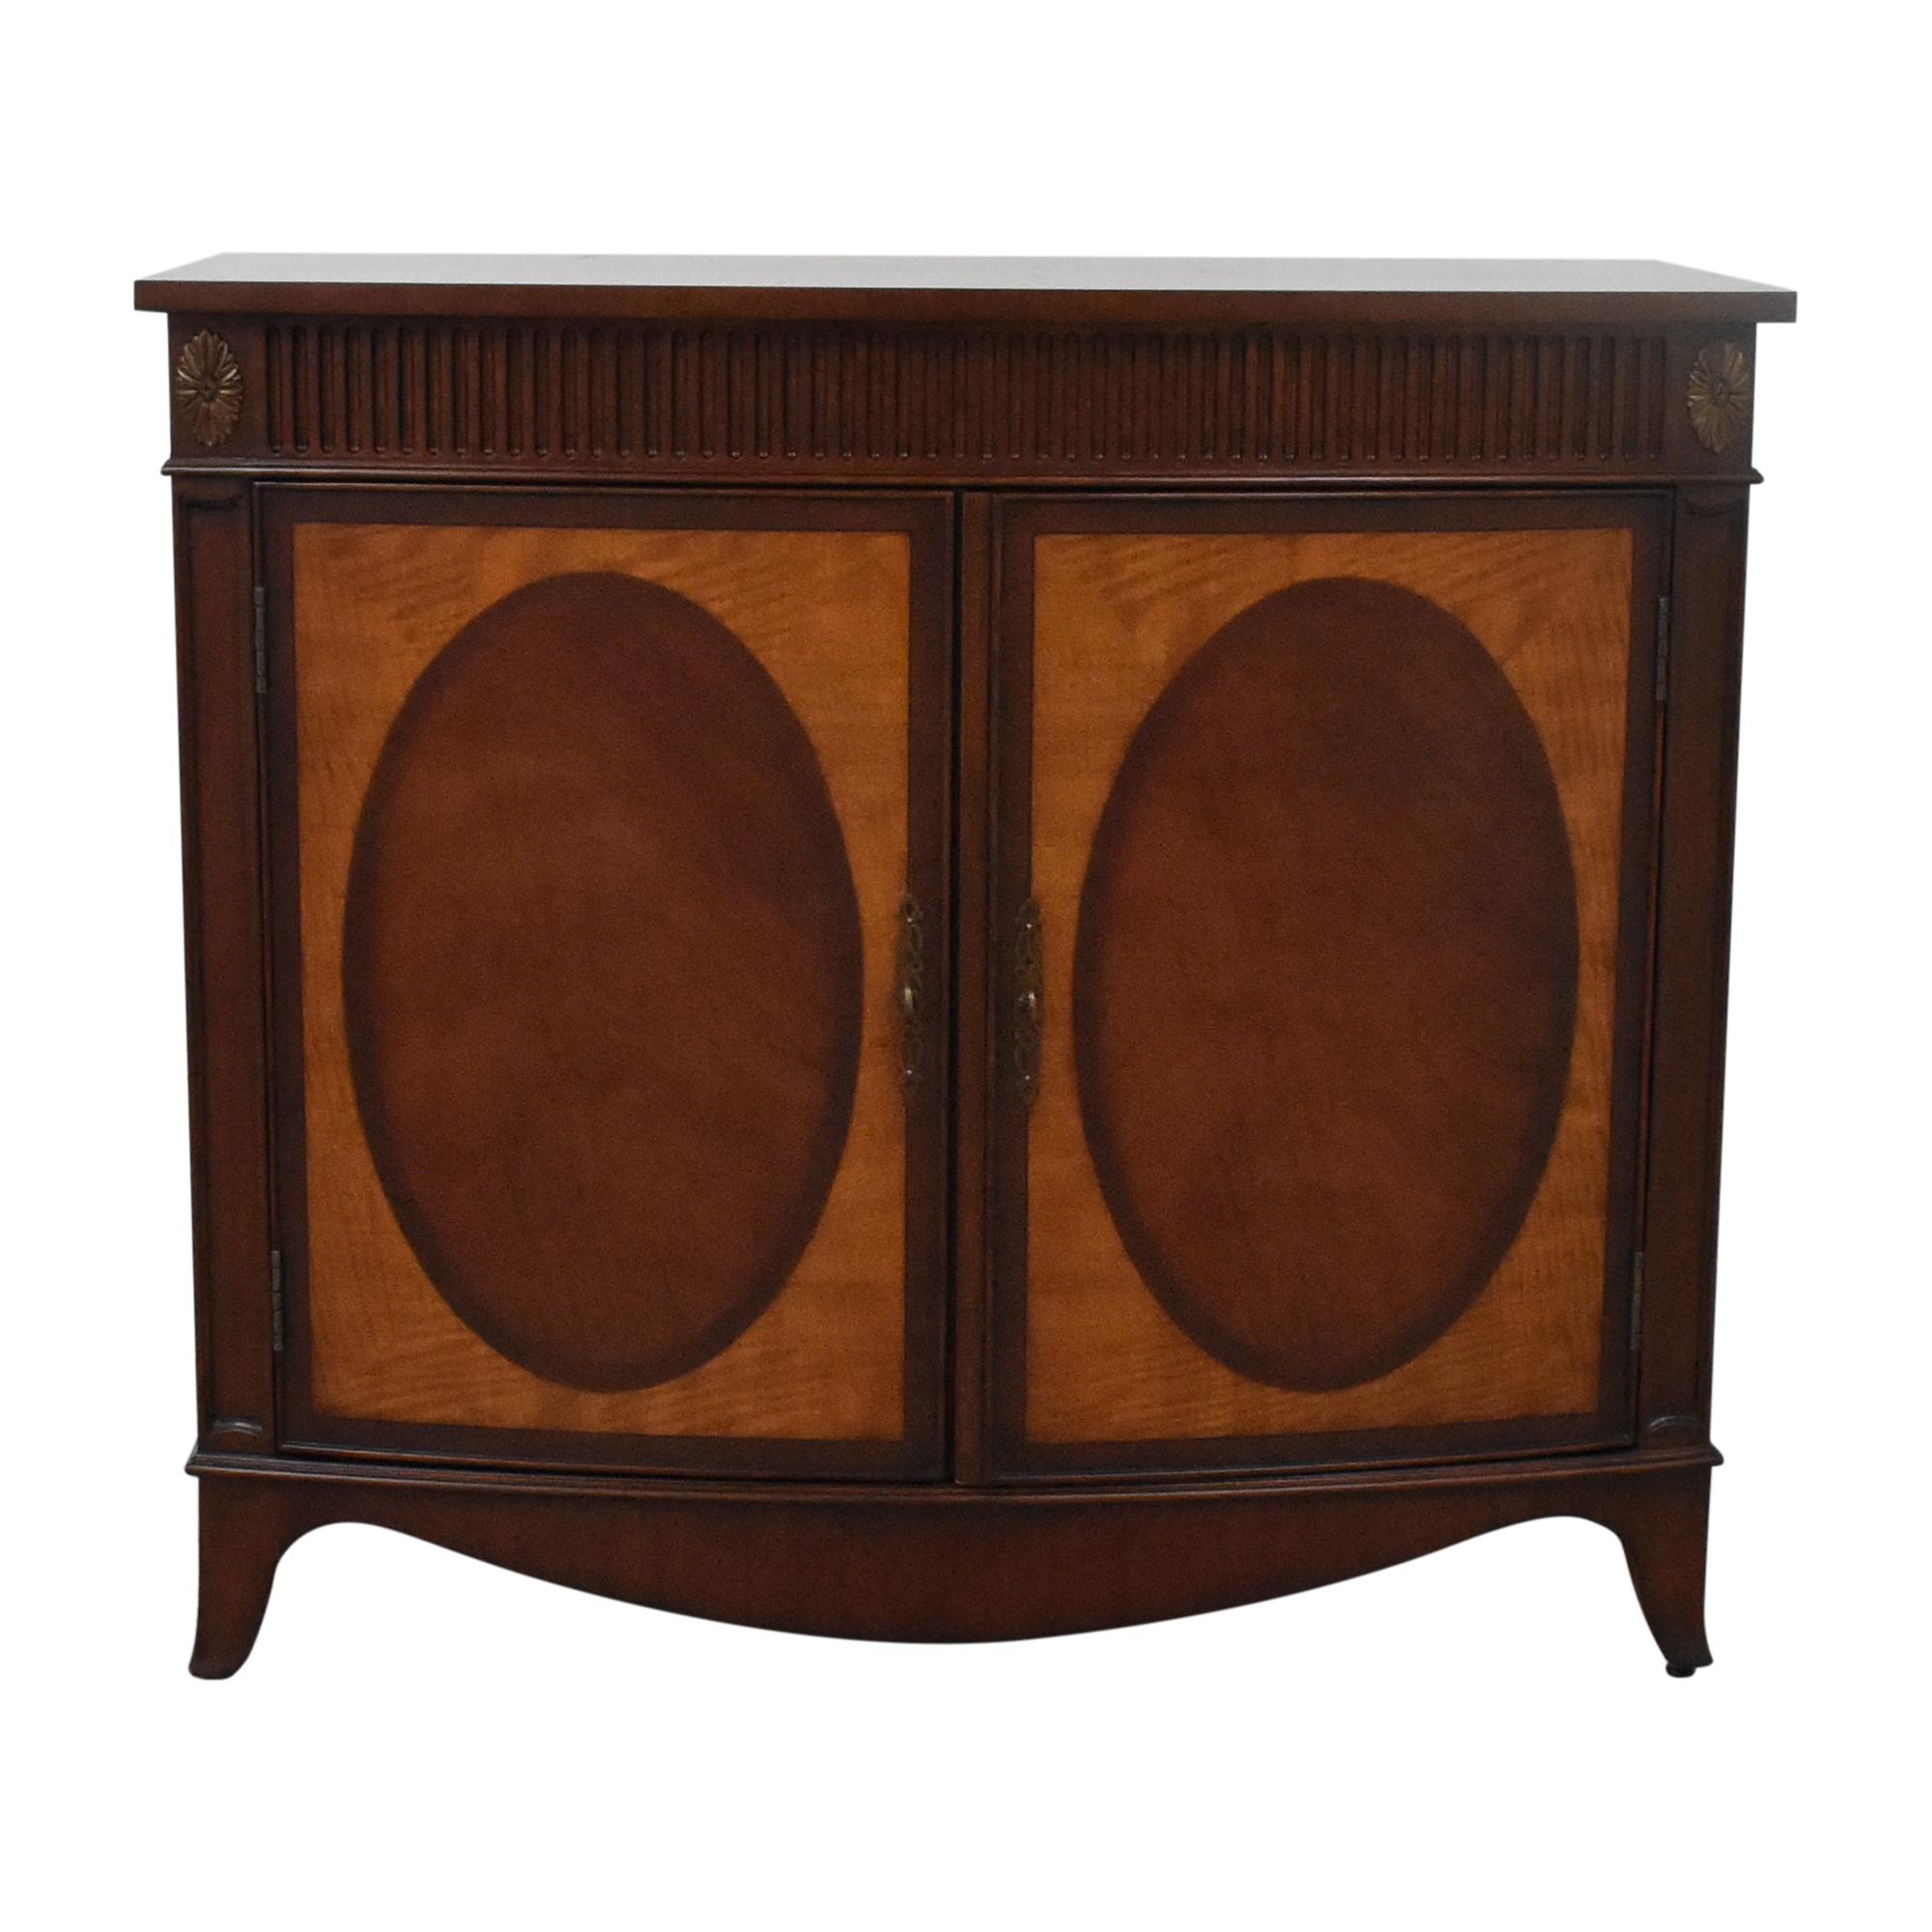 Ethan Allen Ethan Allen Easton Server Cabinets & Sideboards